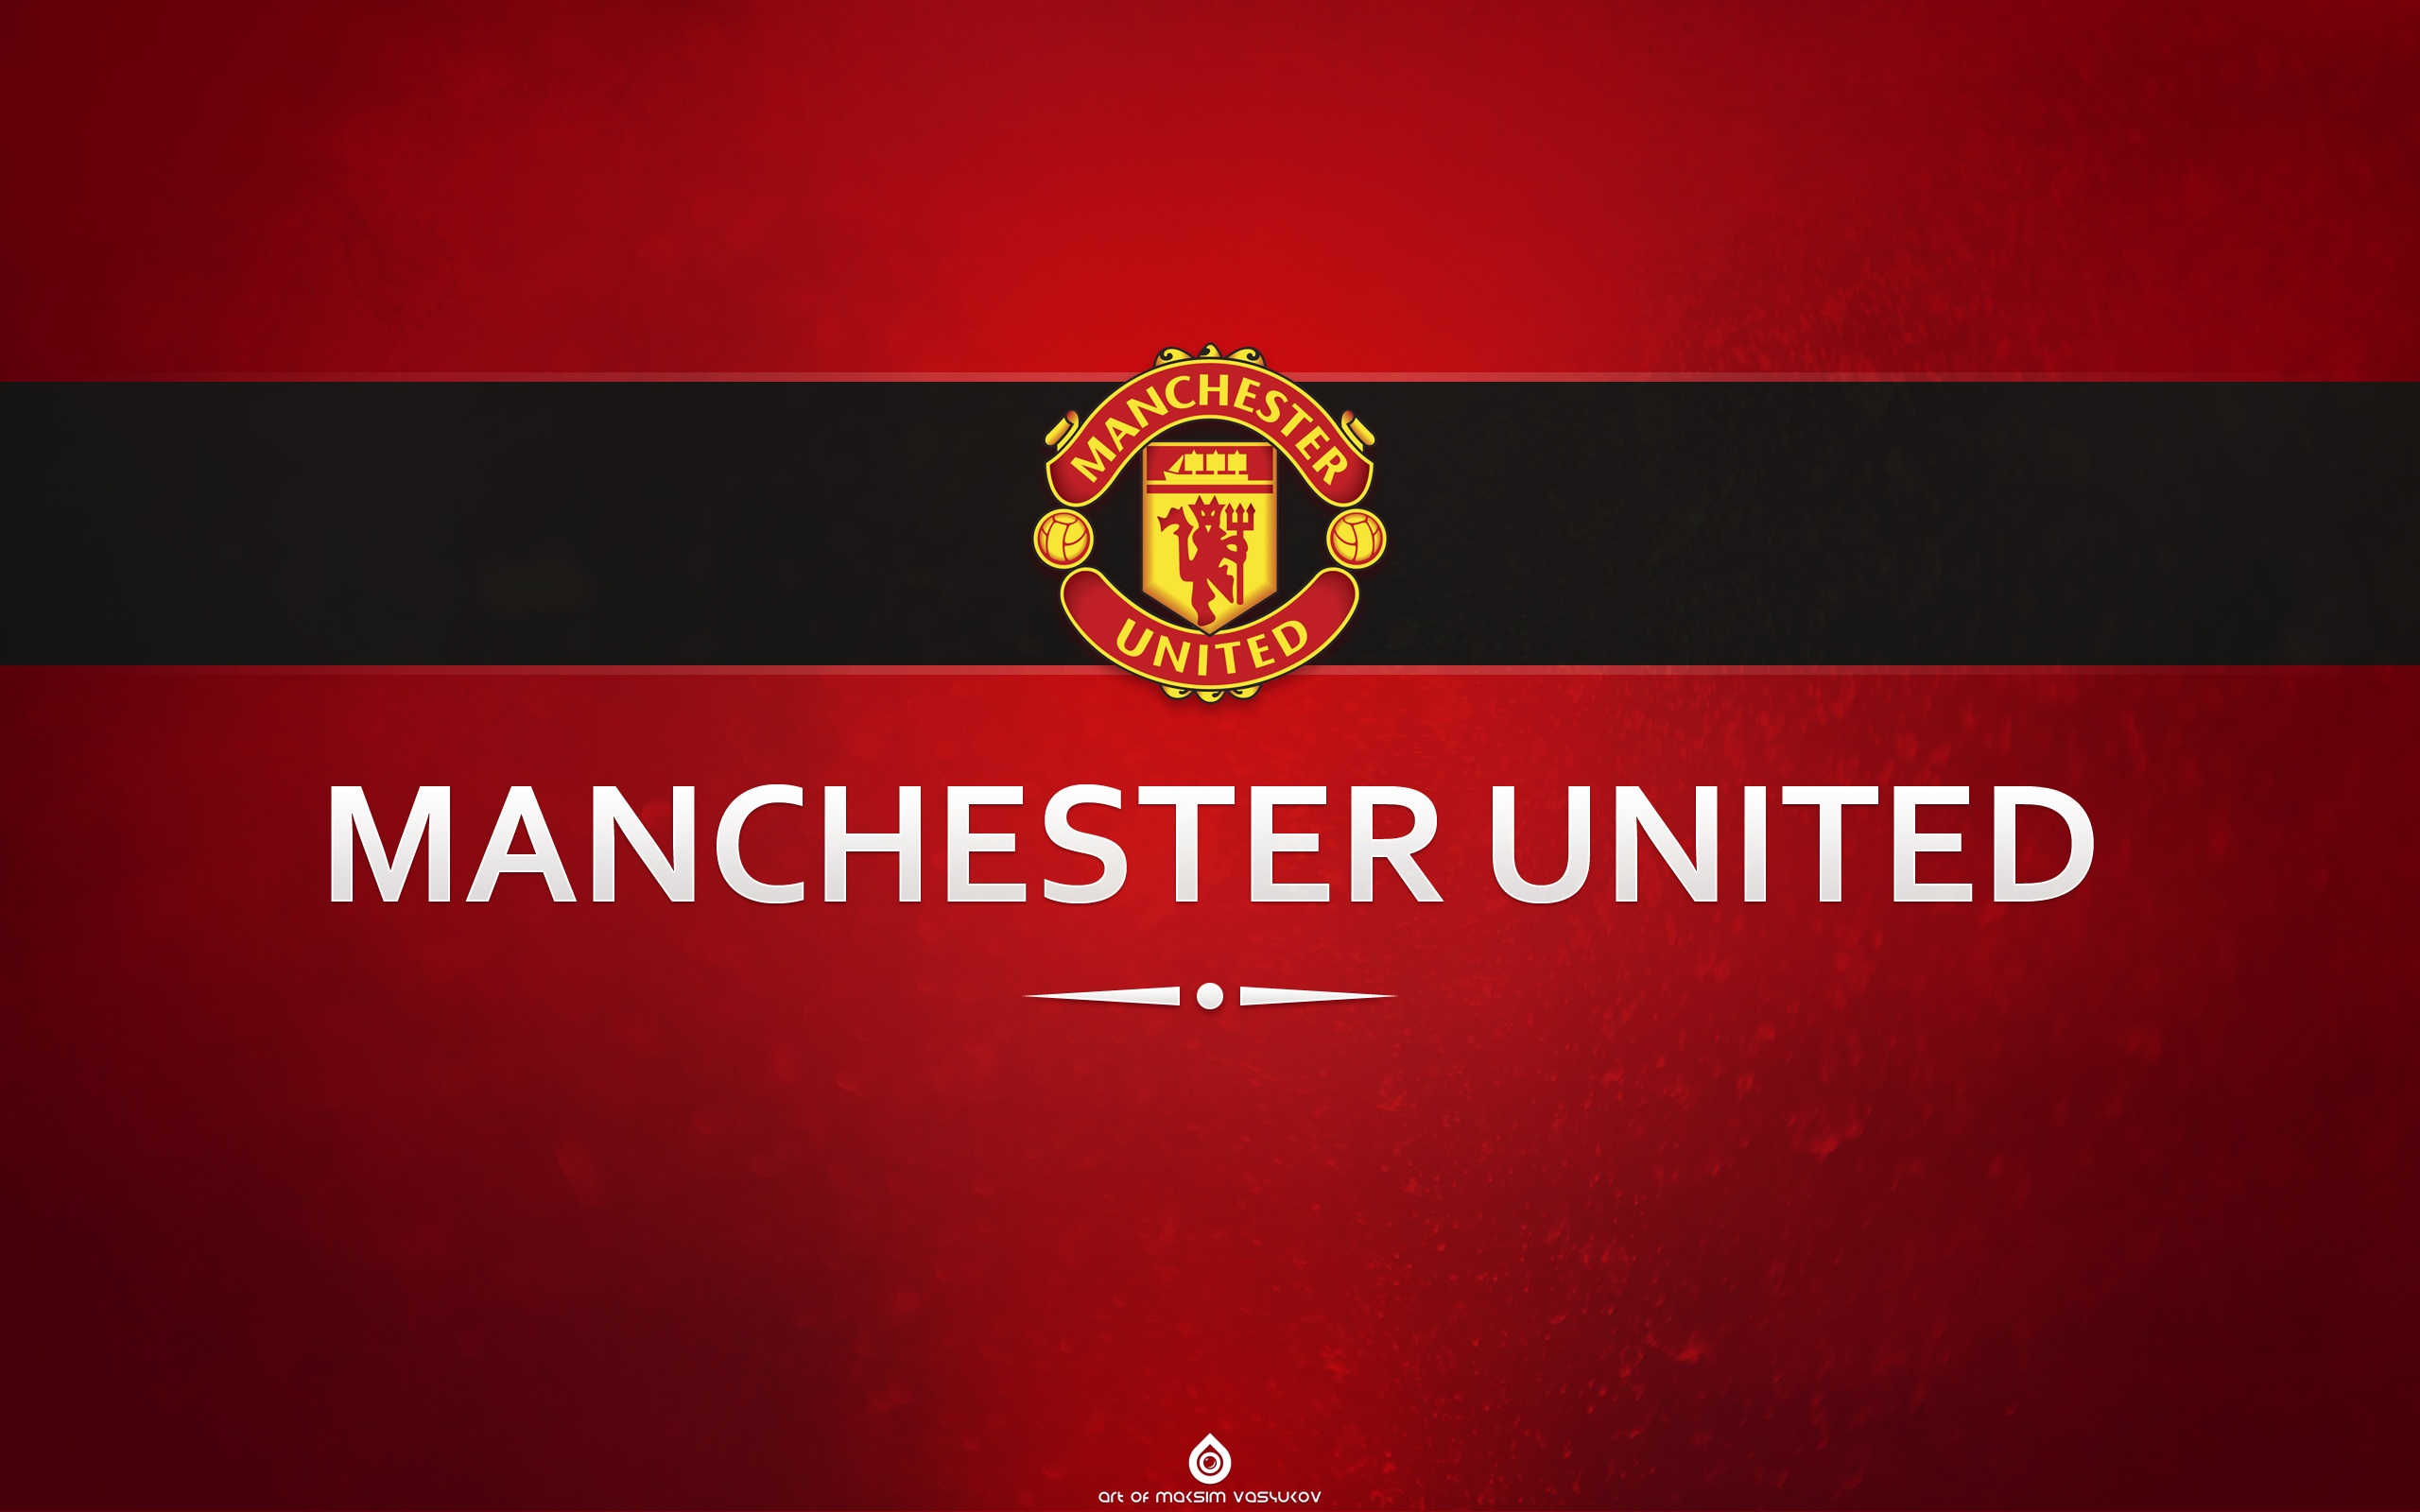 Manchester United без смс